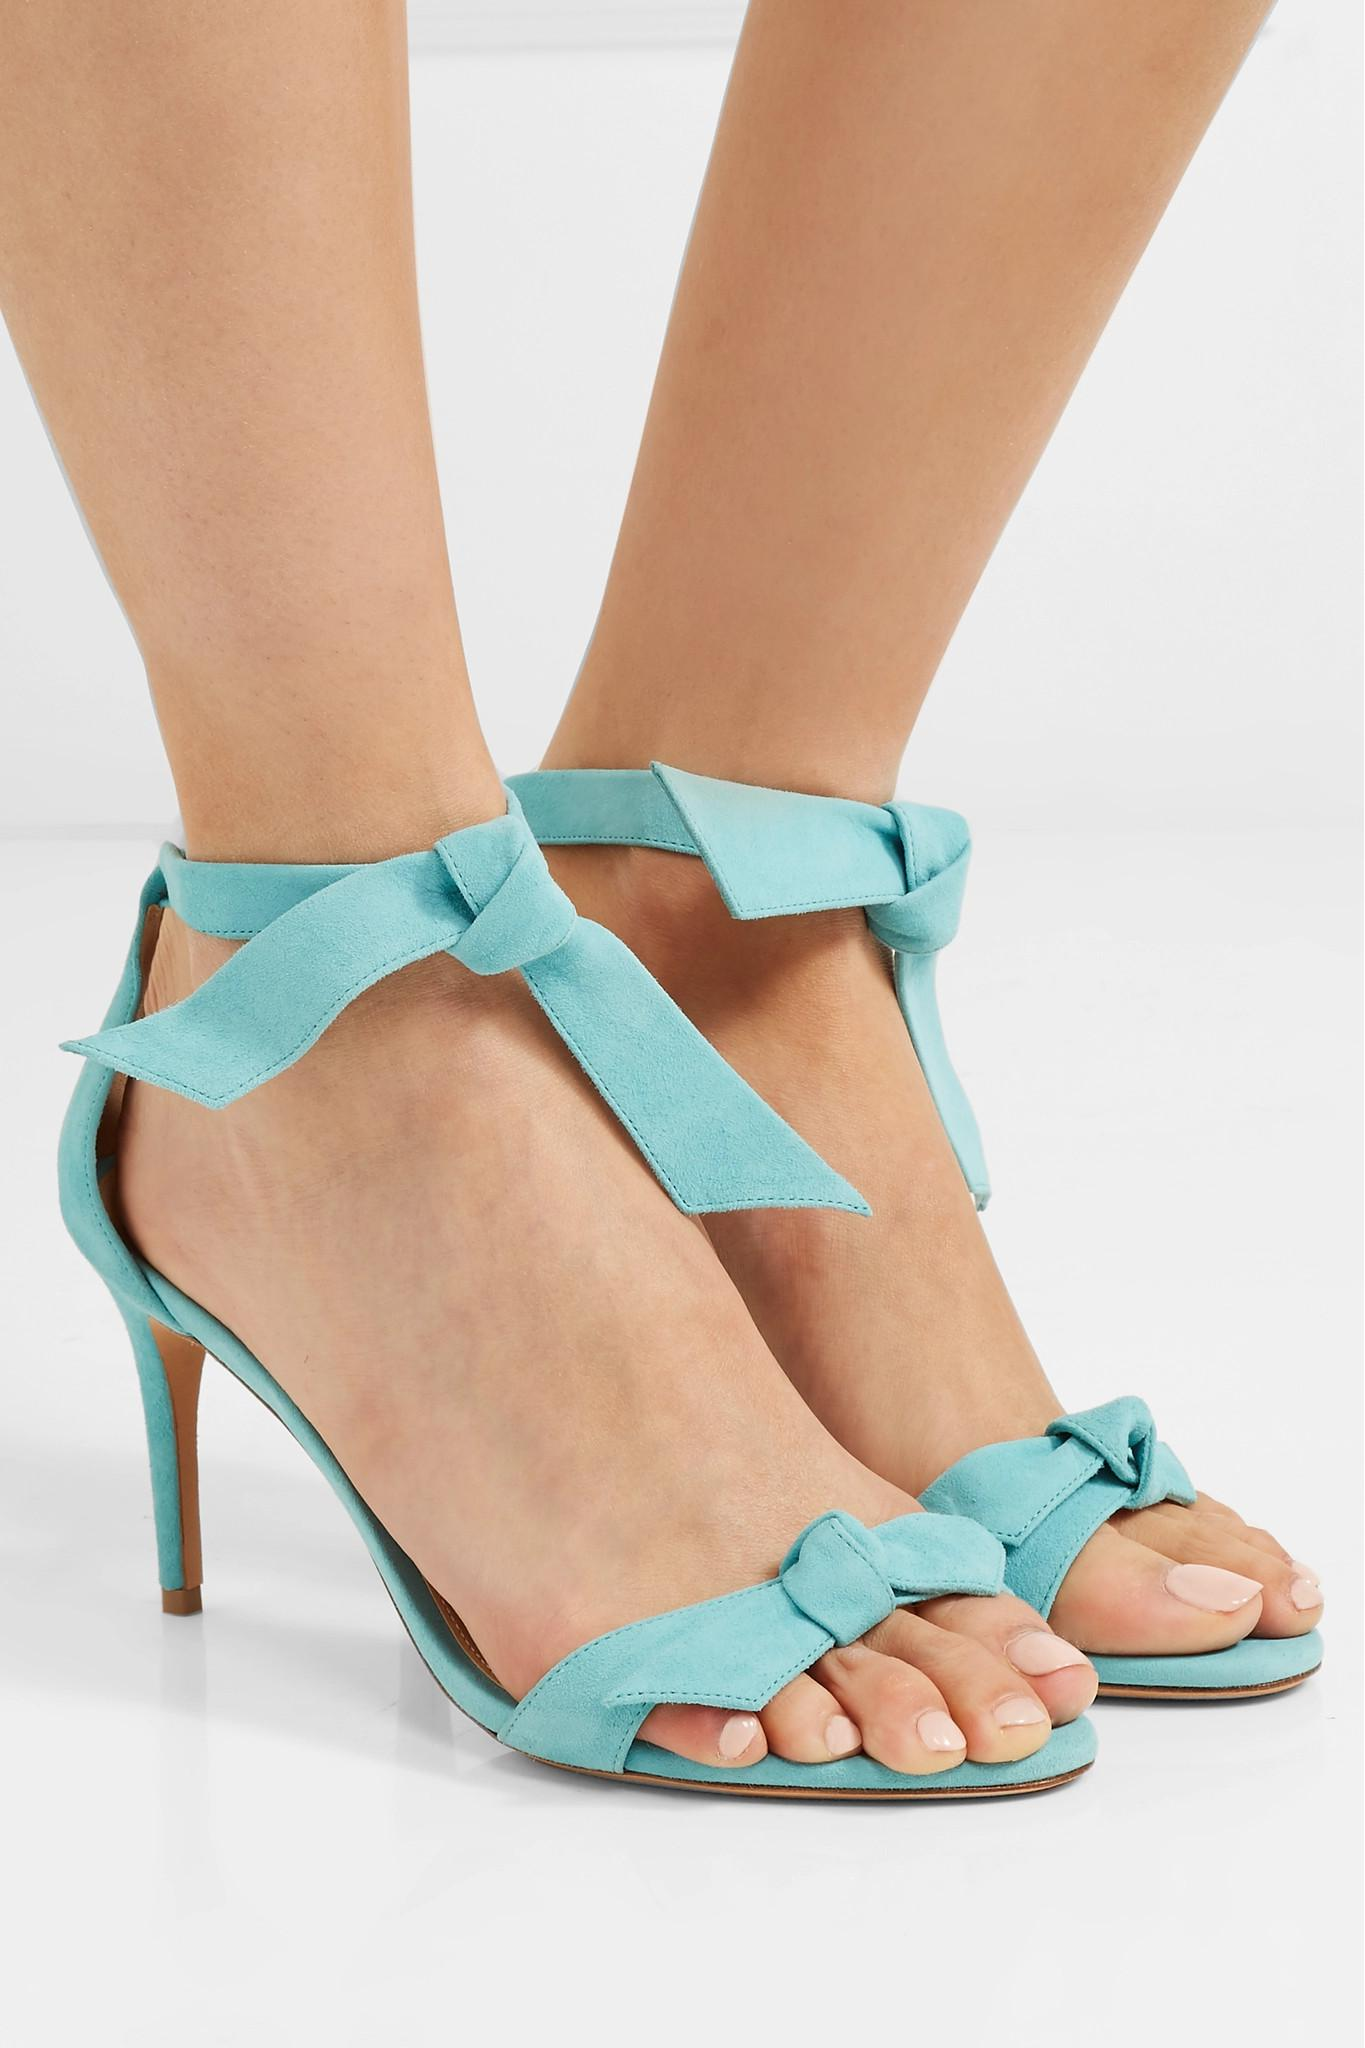 e0738f236 alexandre-birman-sky-blue-Clarita-Bow-embellished-Suede-Sandals.jpeg